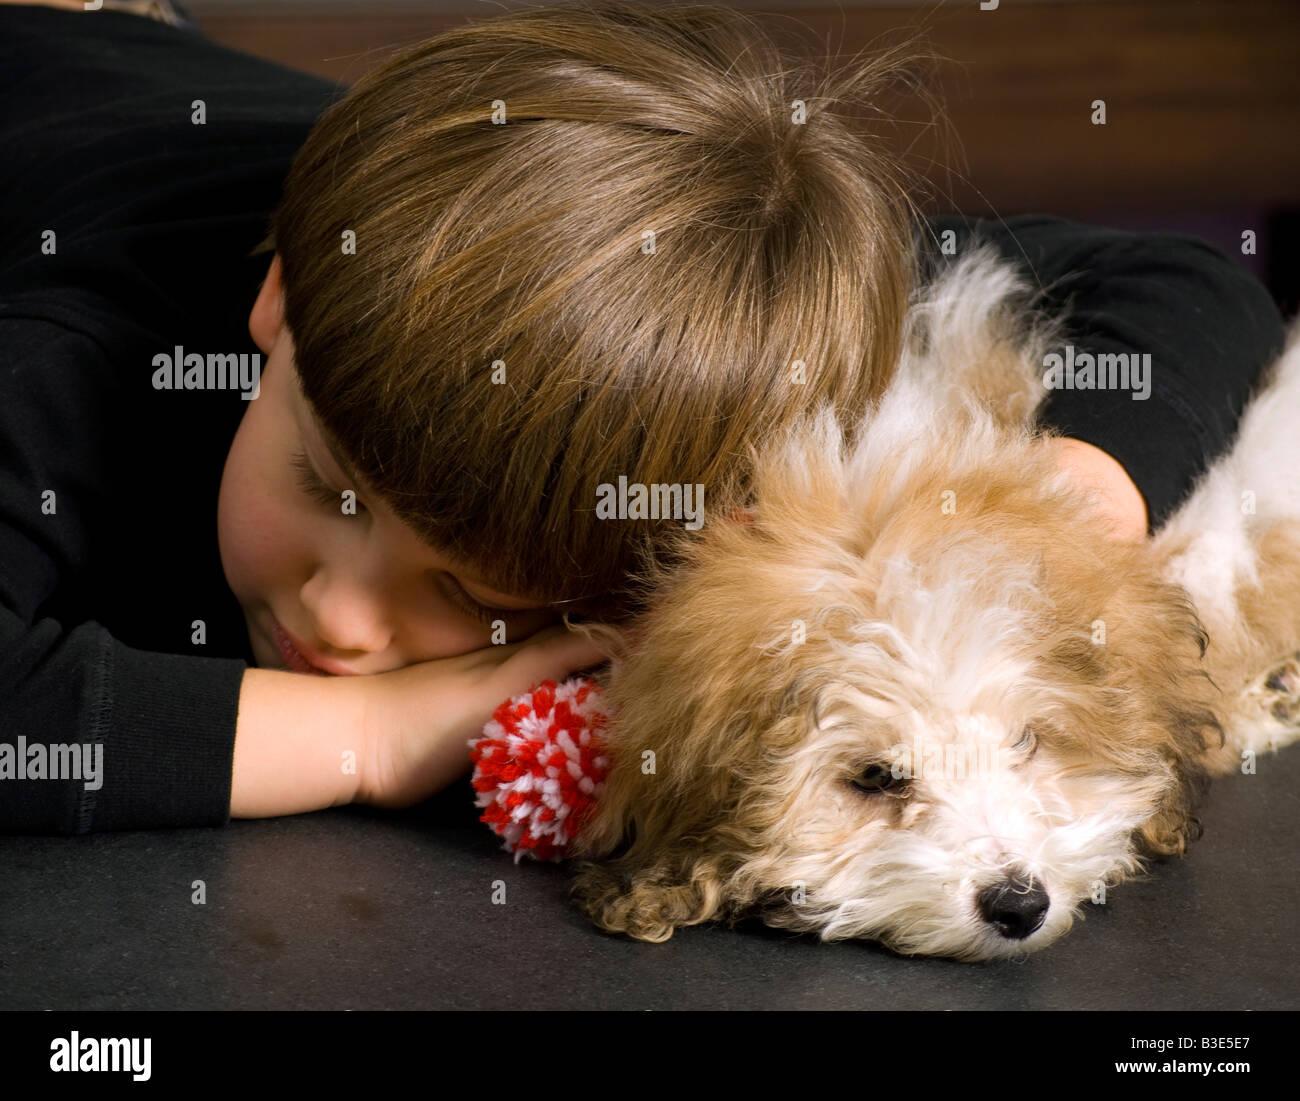 Boy age 7 and dog sleeping - Stock Image